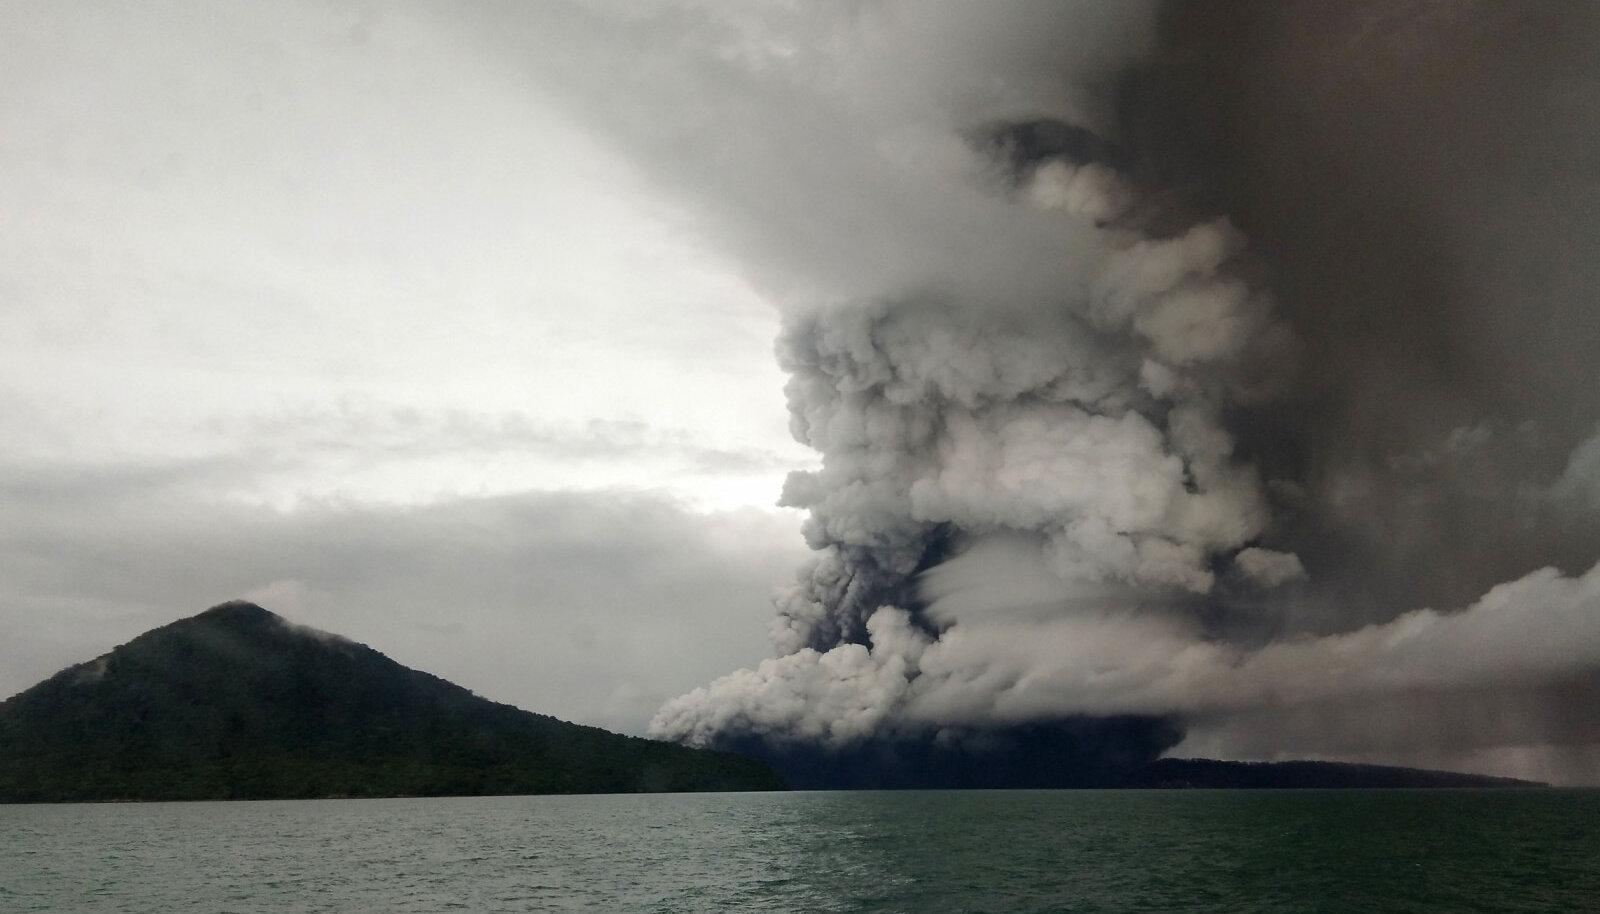 Anak Krakatau vulkaan eile.